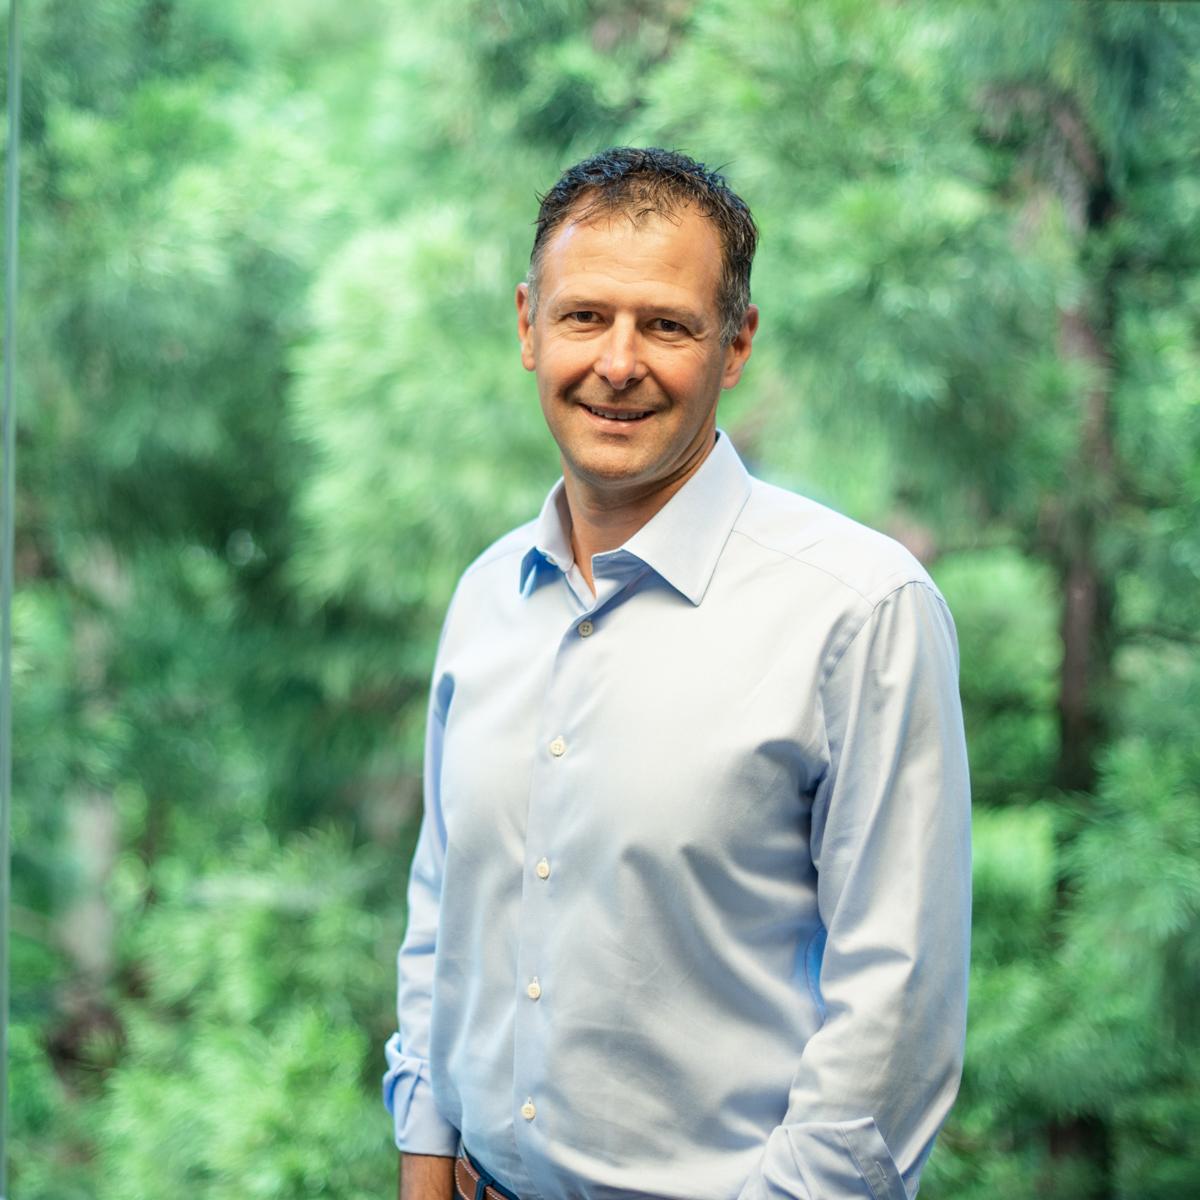 Jeffrey G. Mussatt